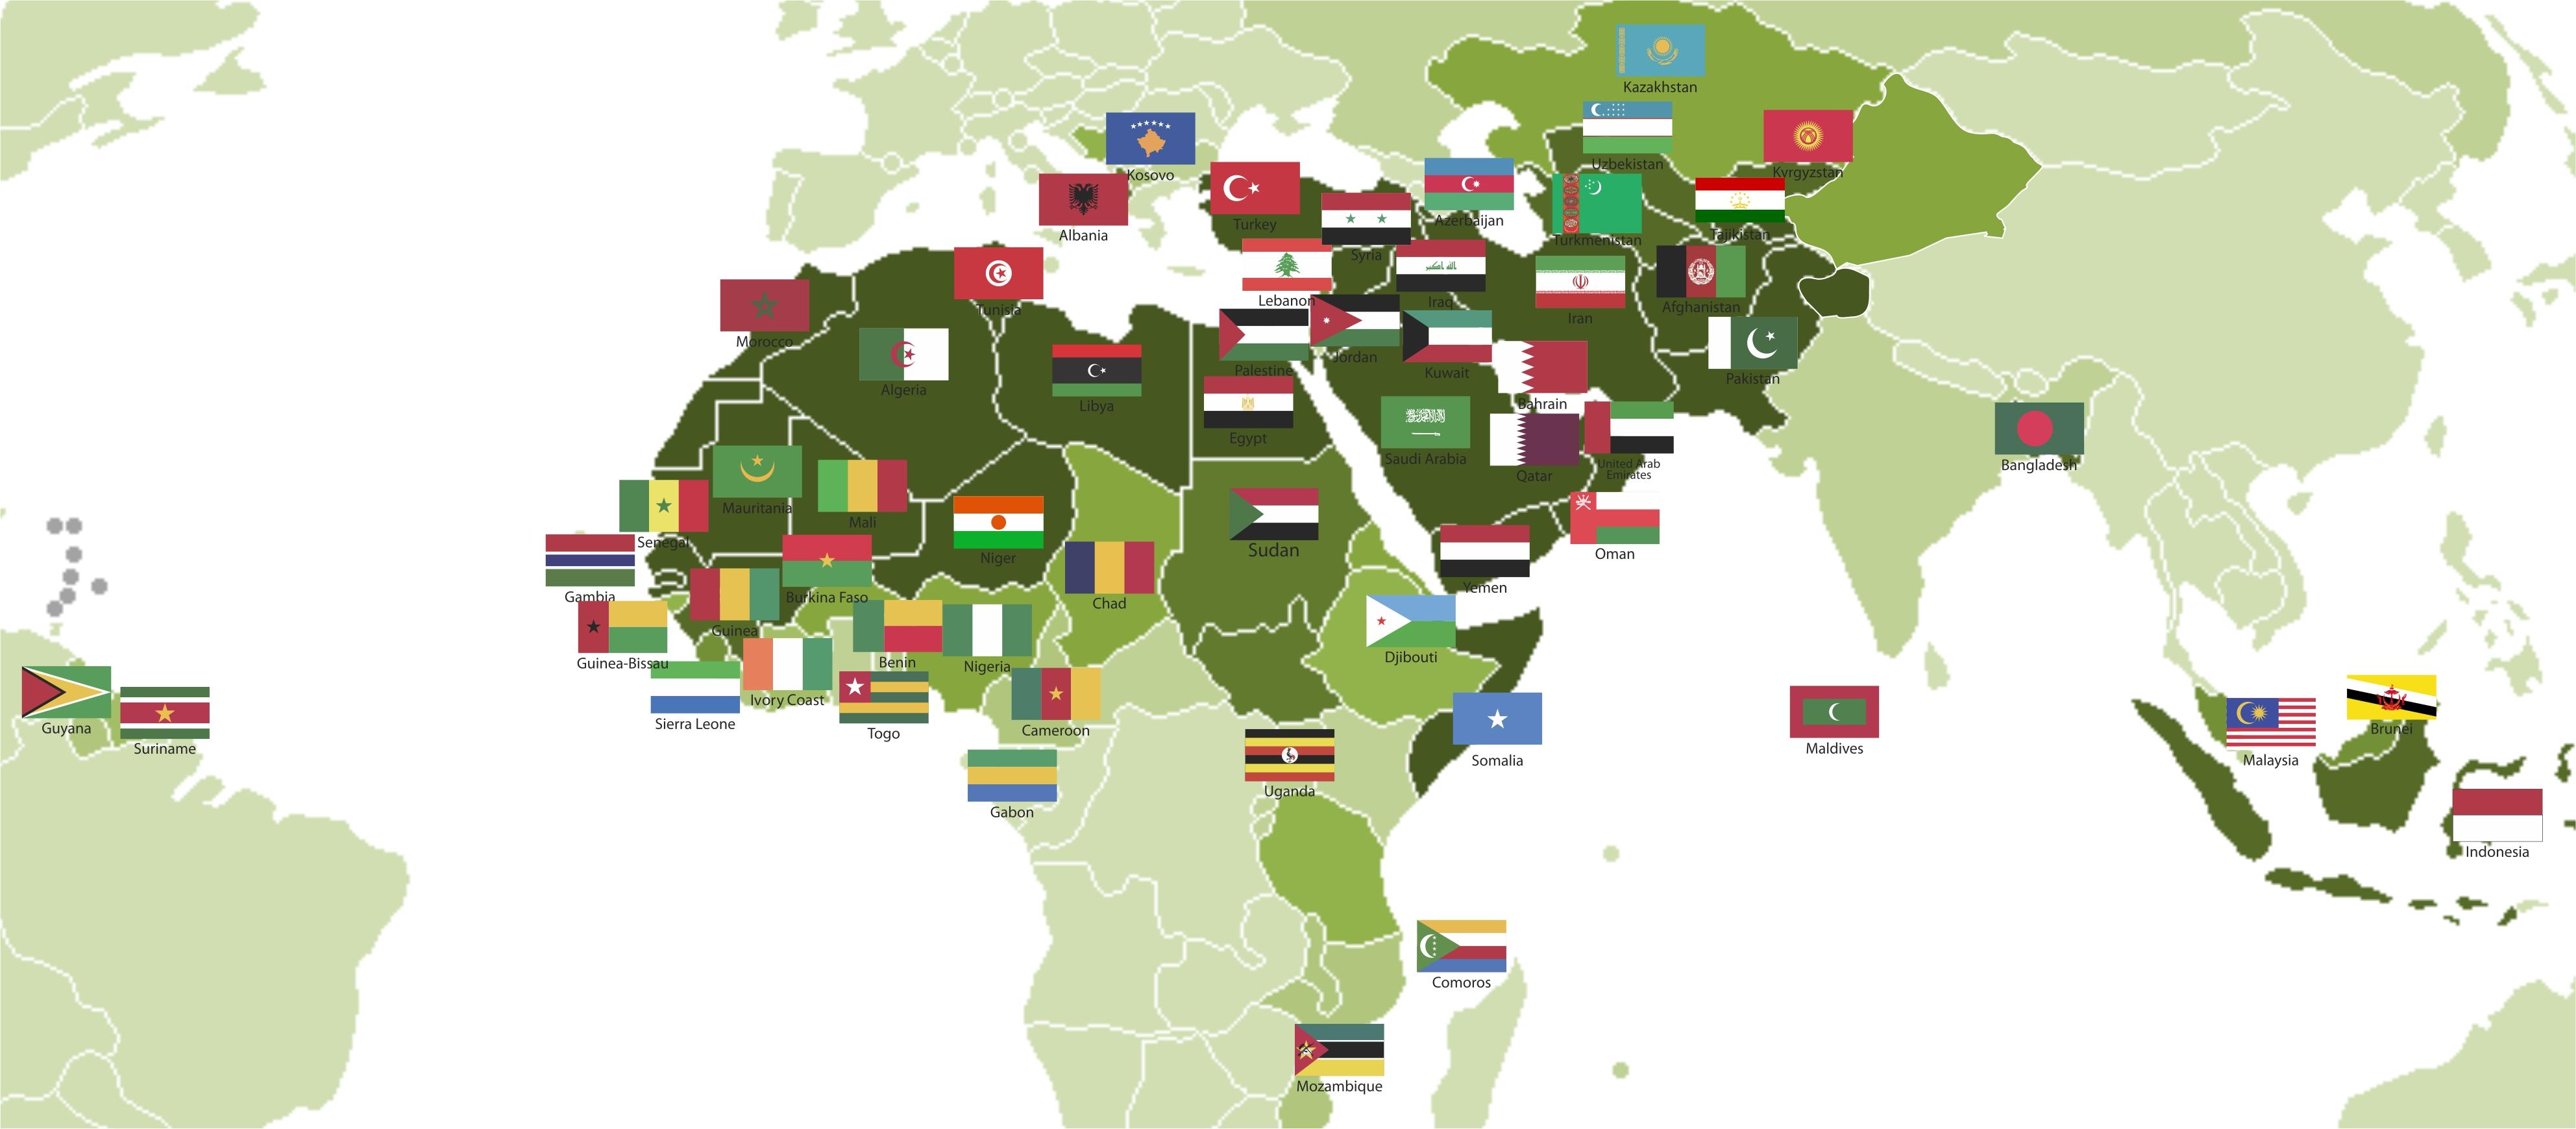 muslimworldlinkcom Economy Business Education and Tourism about